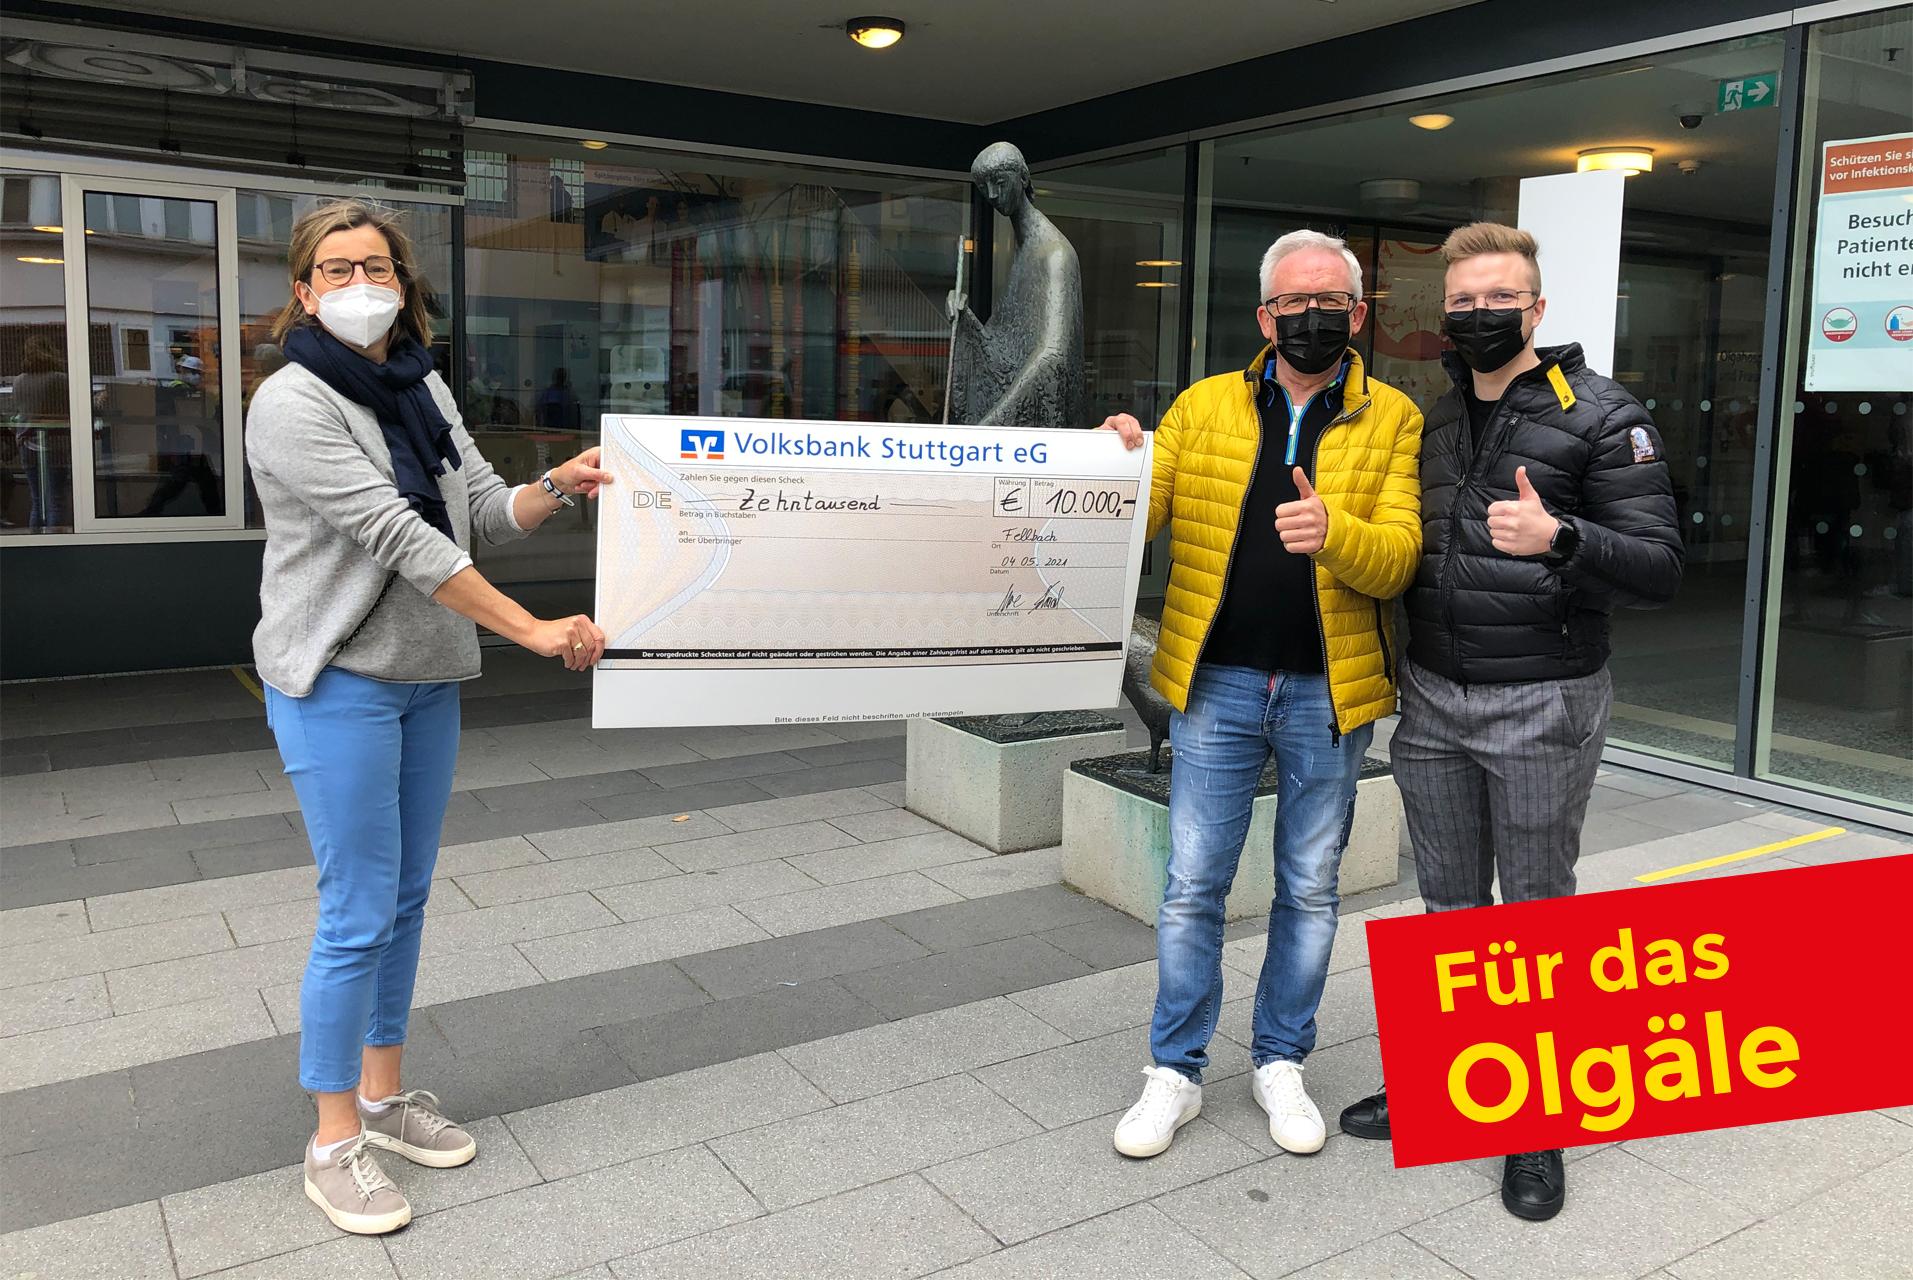 Spenden_Olgaele_Uebergabe_Schaal